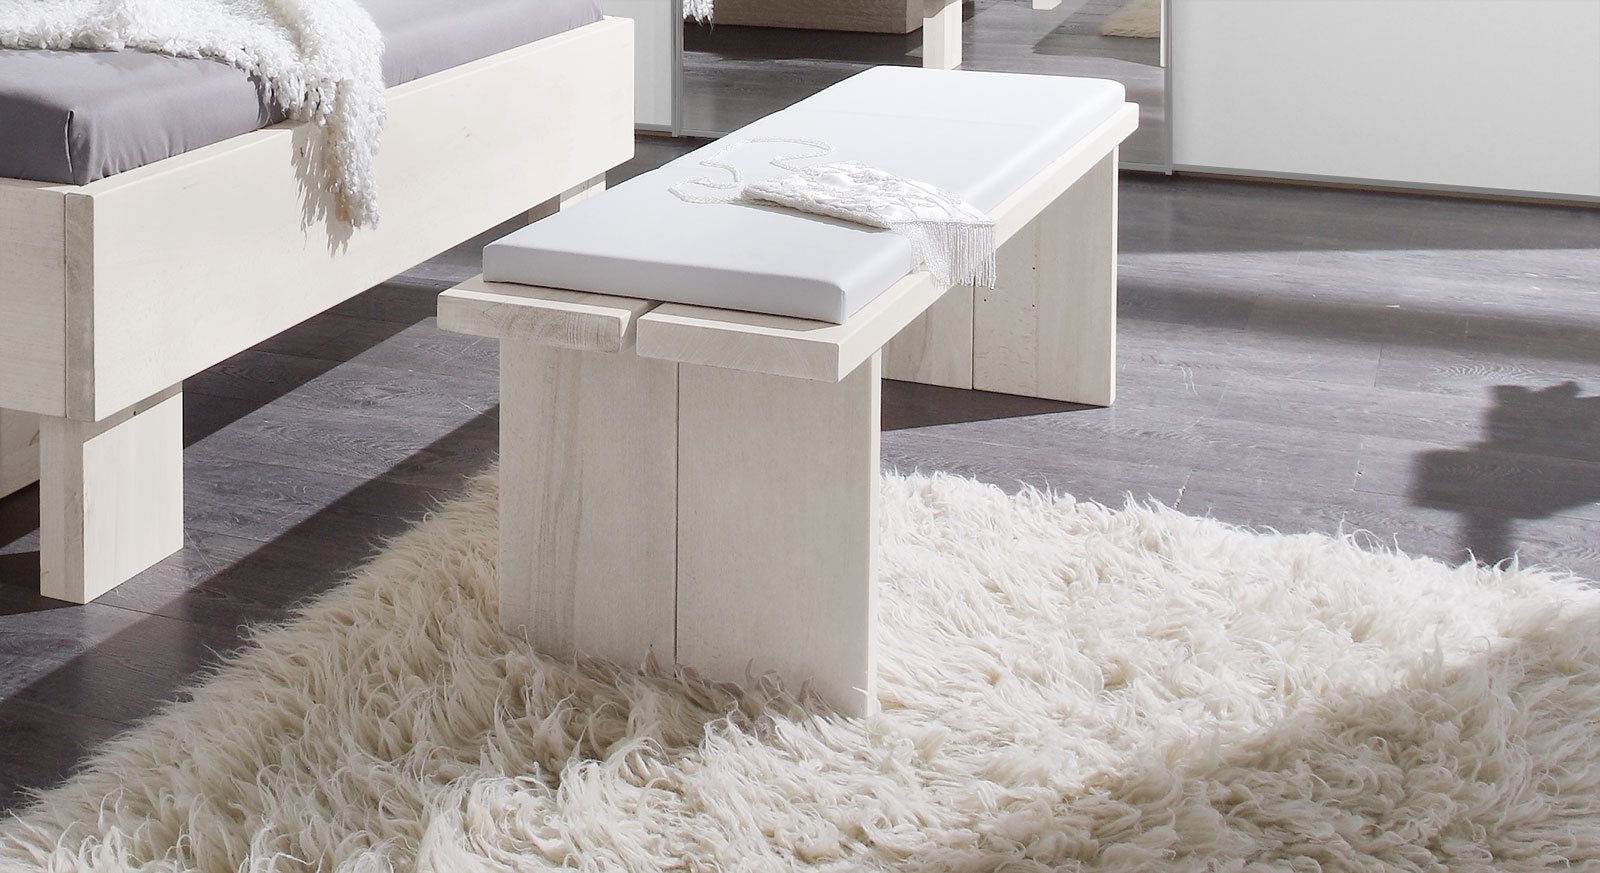 bank schlafzimmer hausgestaltung ideen. Black Bedroom Furniture Sets. Home Design Ideas